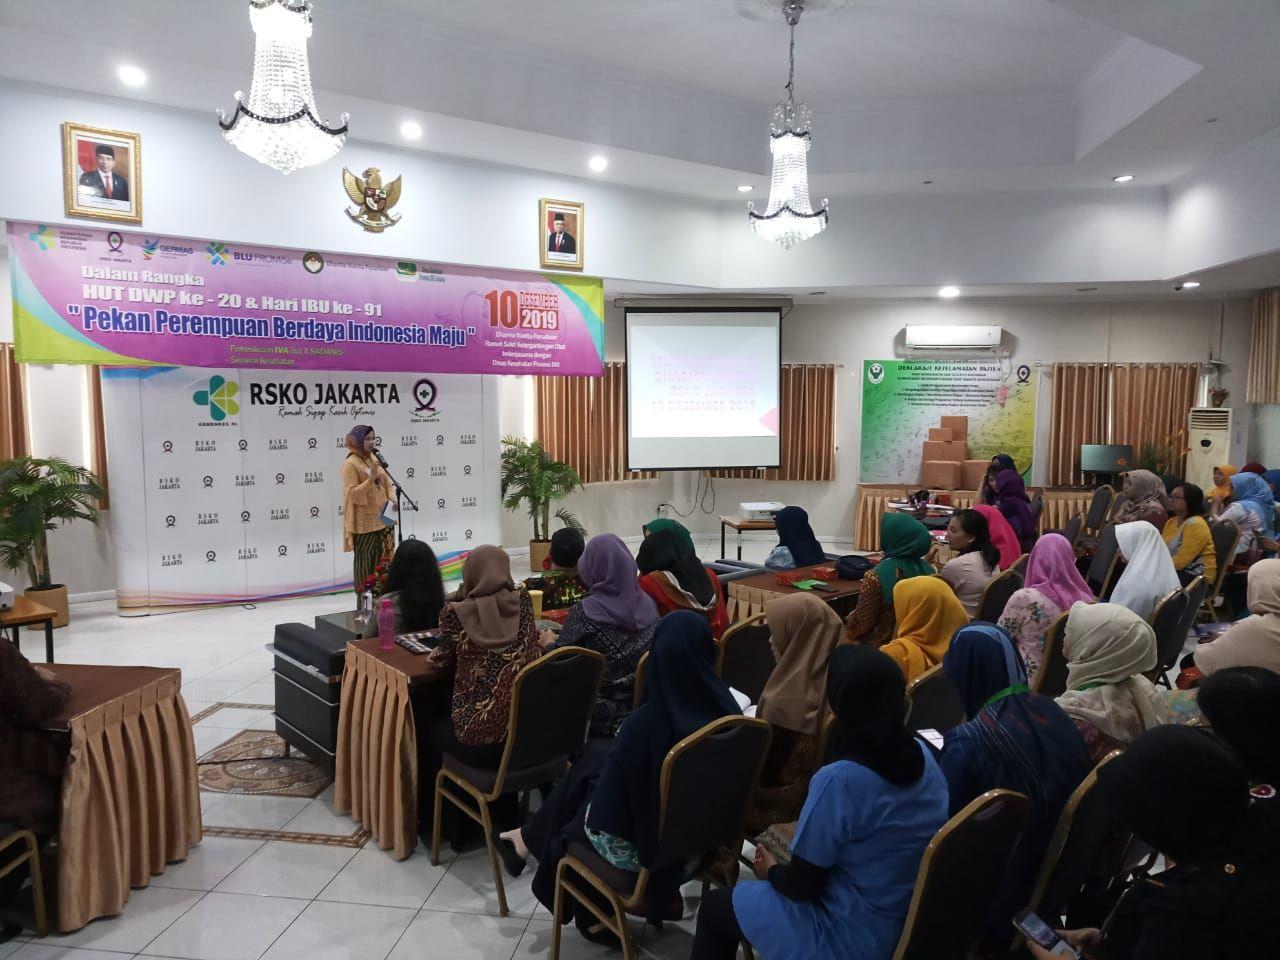 Deskripsi : ketua Dharma Wanita Persatuan RSKO Jakarta, Ibu Sri Hartanti Azhar menyampaikan pentingnya pemeriksaan dini I Sumber : RSKO Jakarta